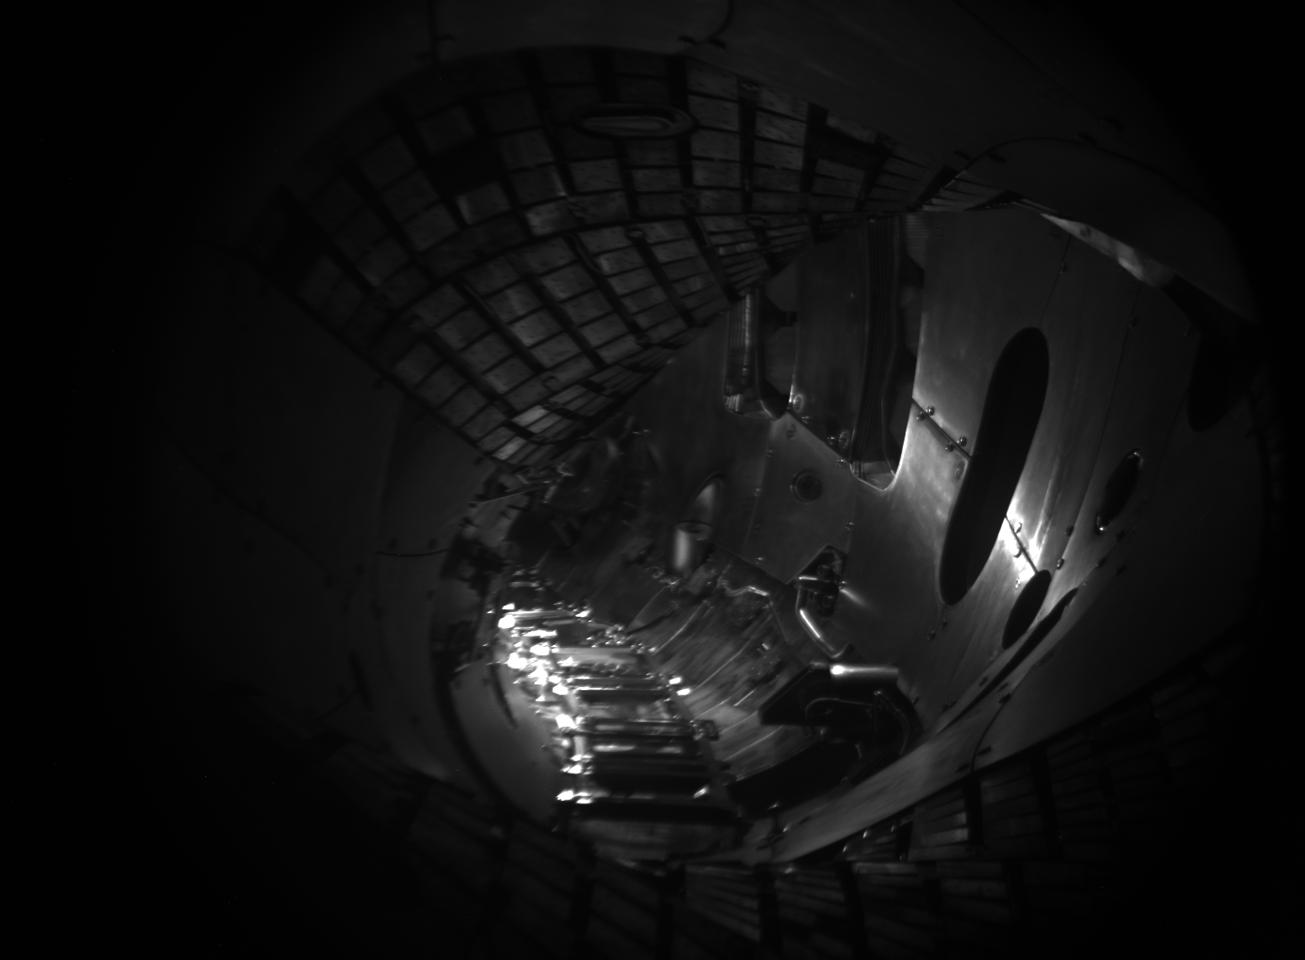 The empty plasma vessel inside Wendelstein 7-X